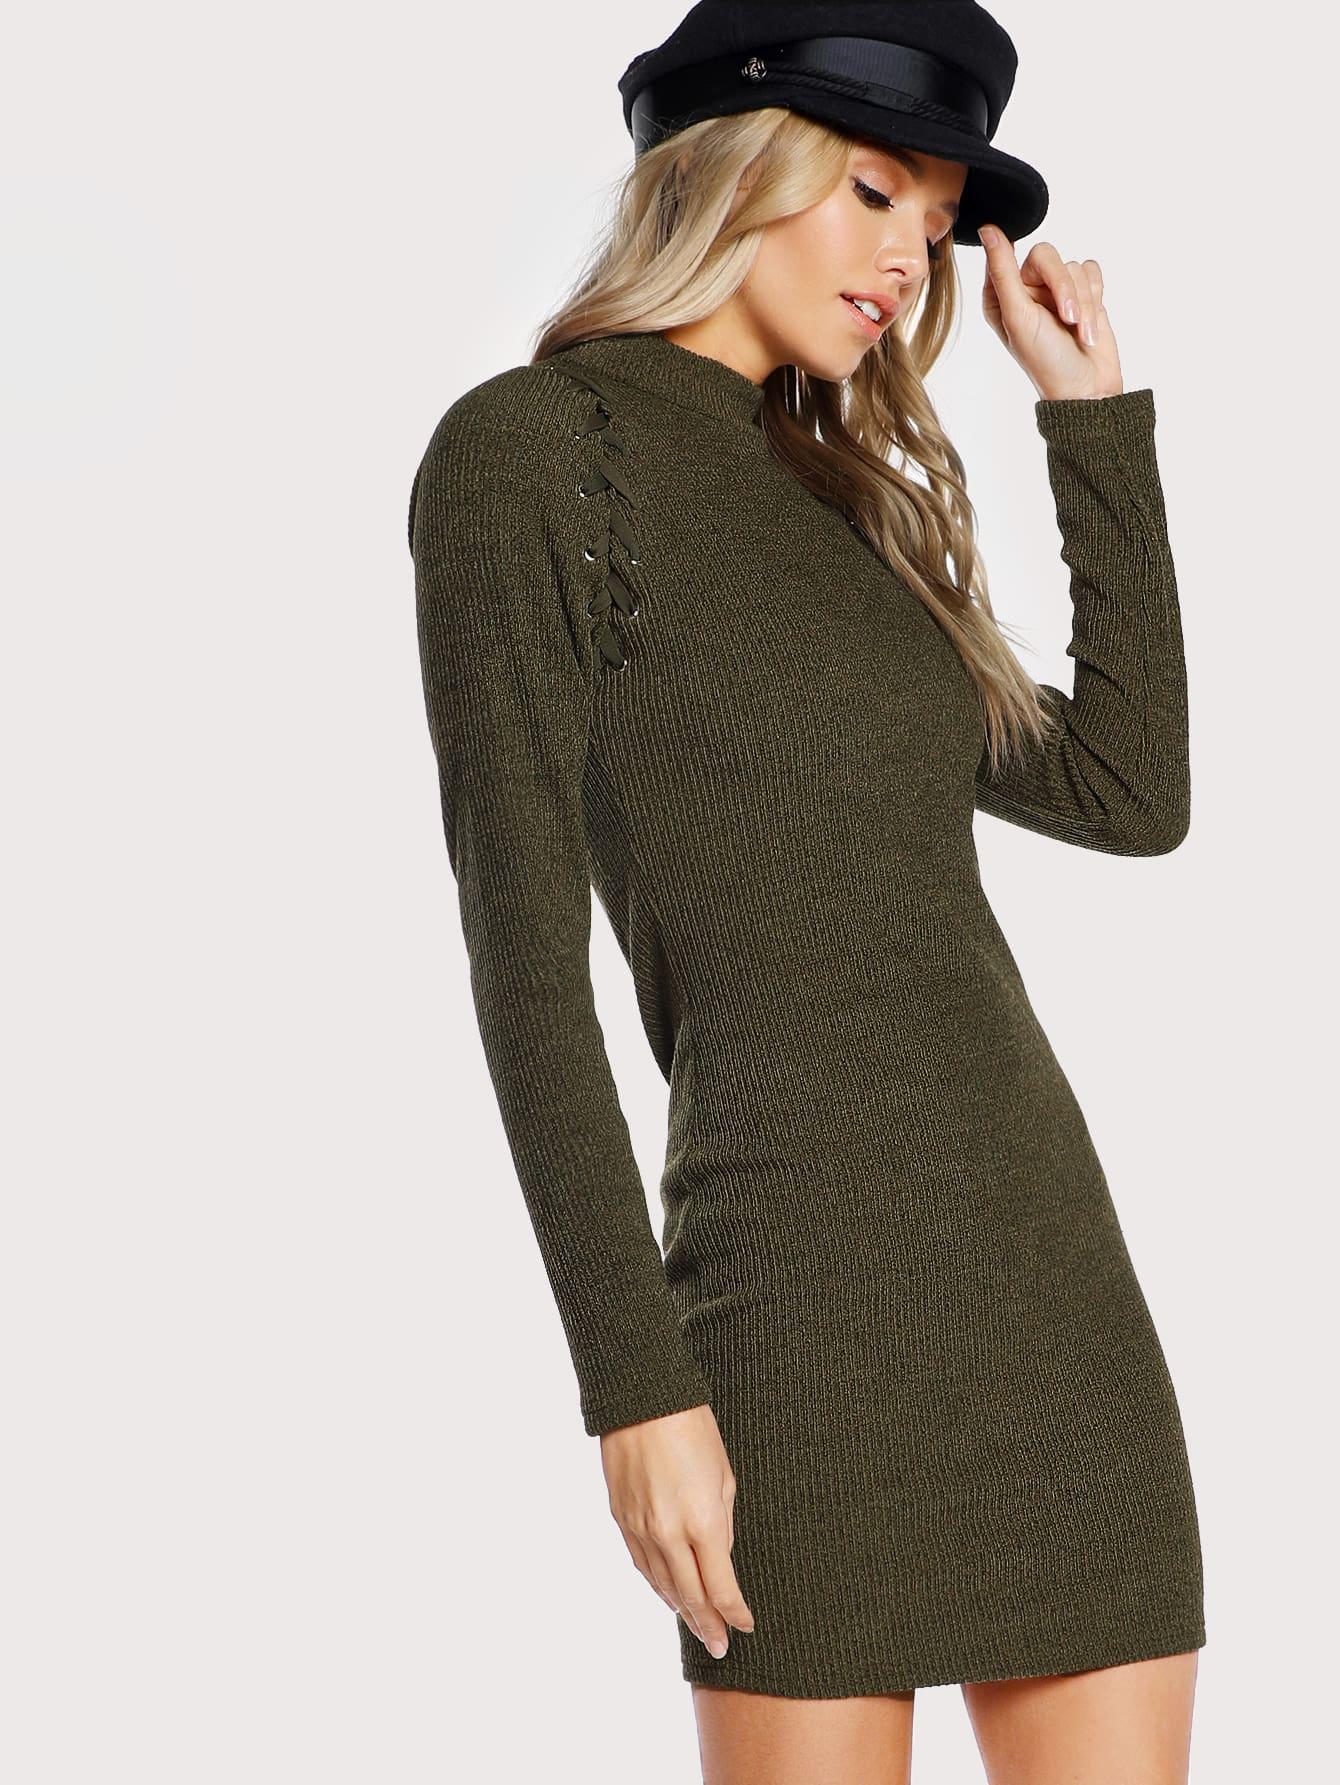 Mock Neck Lace Up Rib Knit Dress